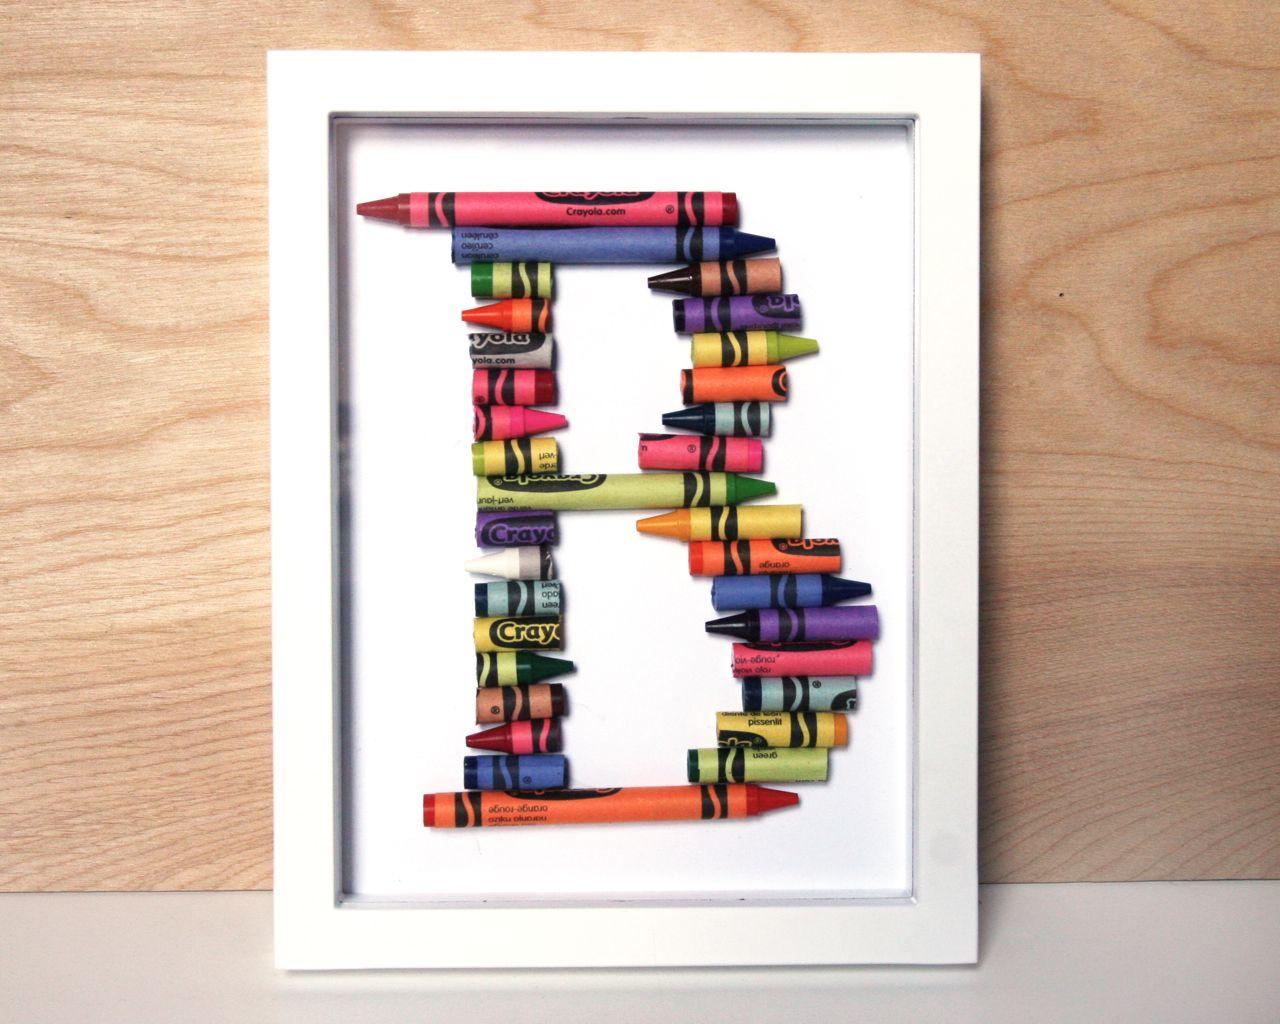 creative alphabet letters - HD1280×1024